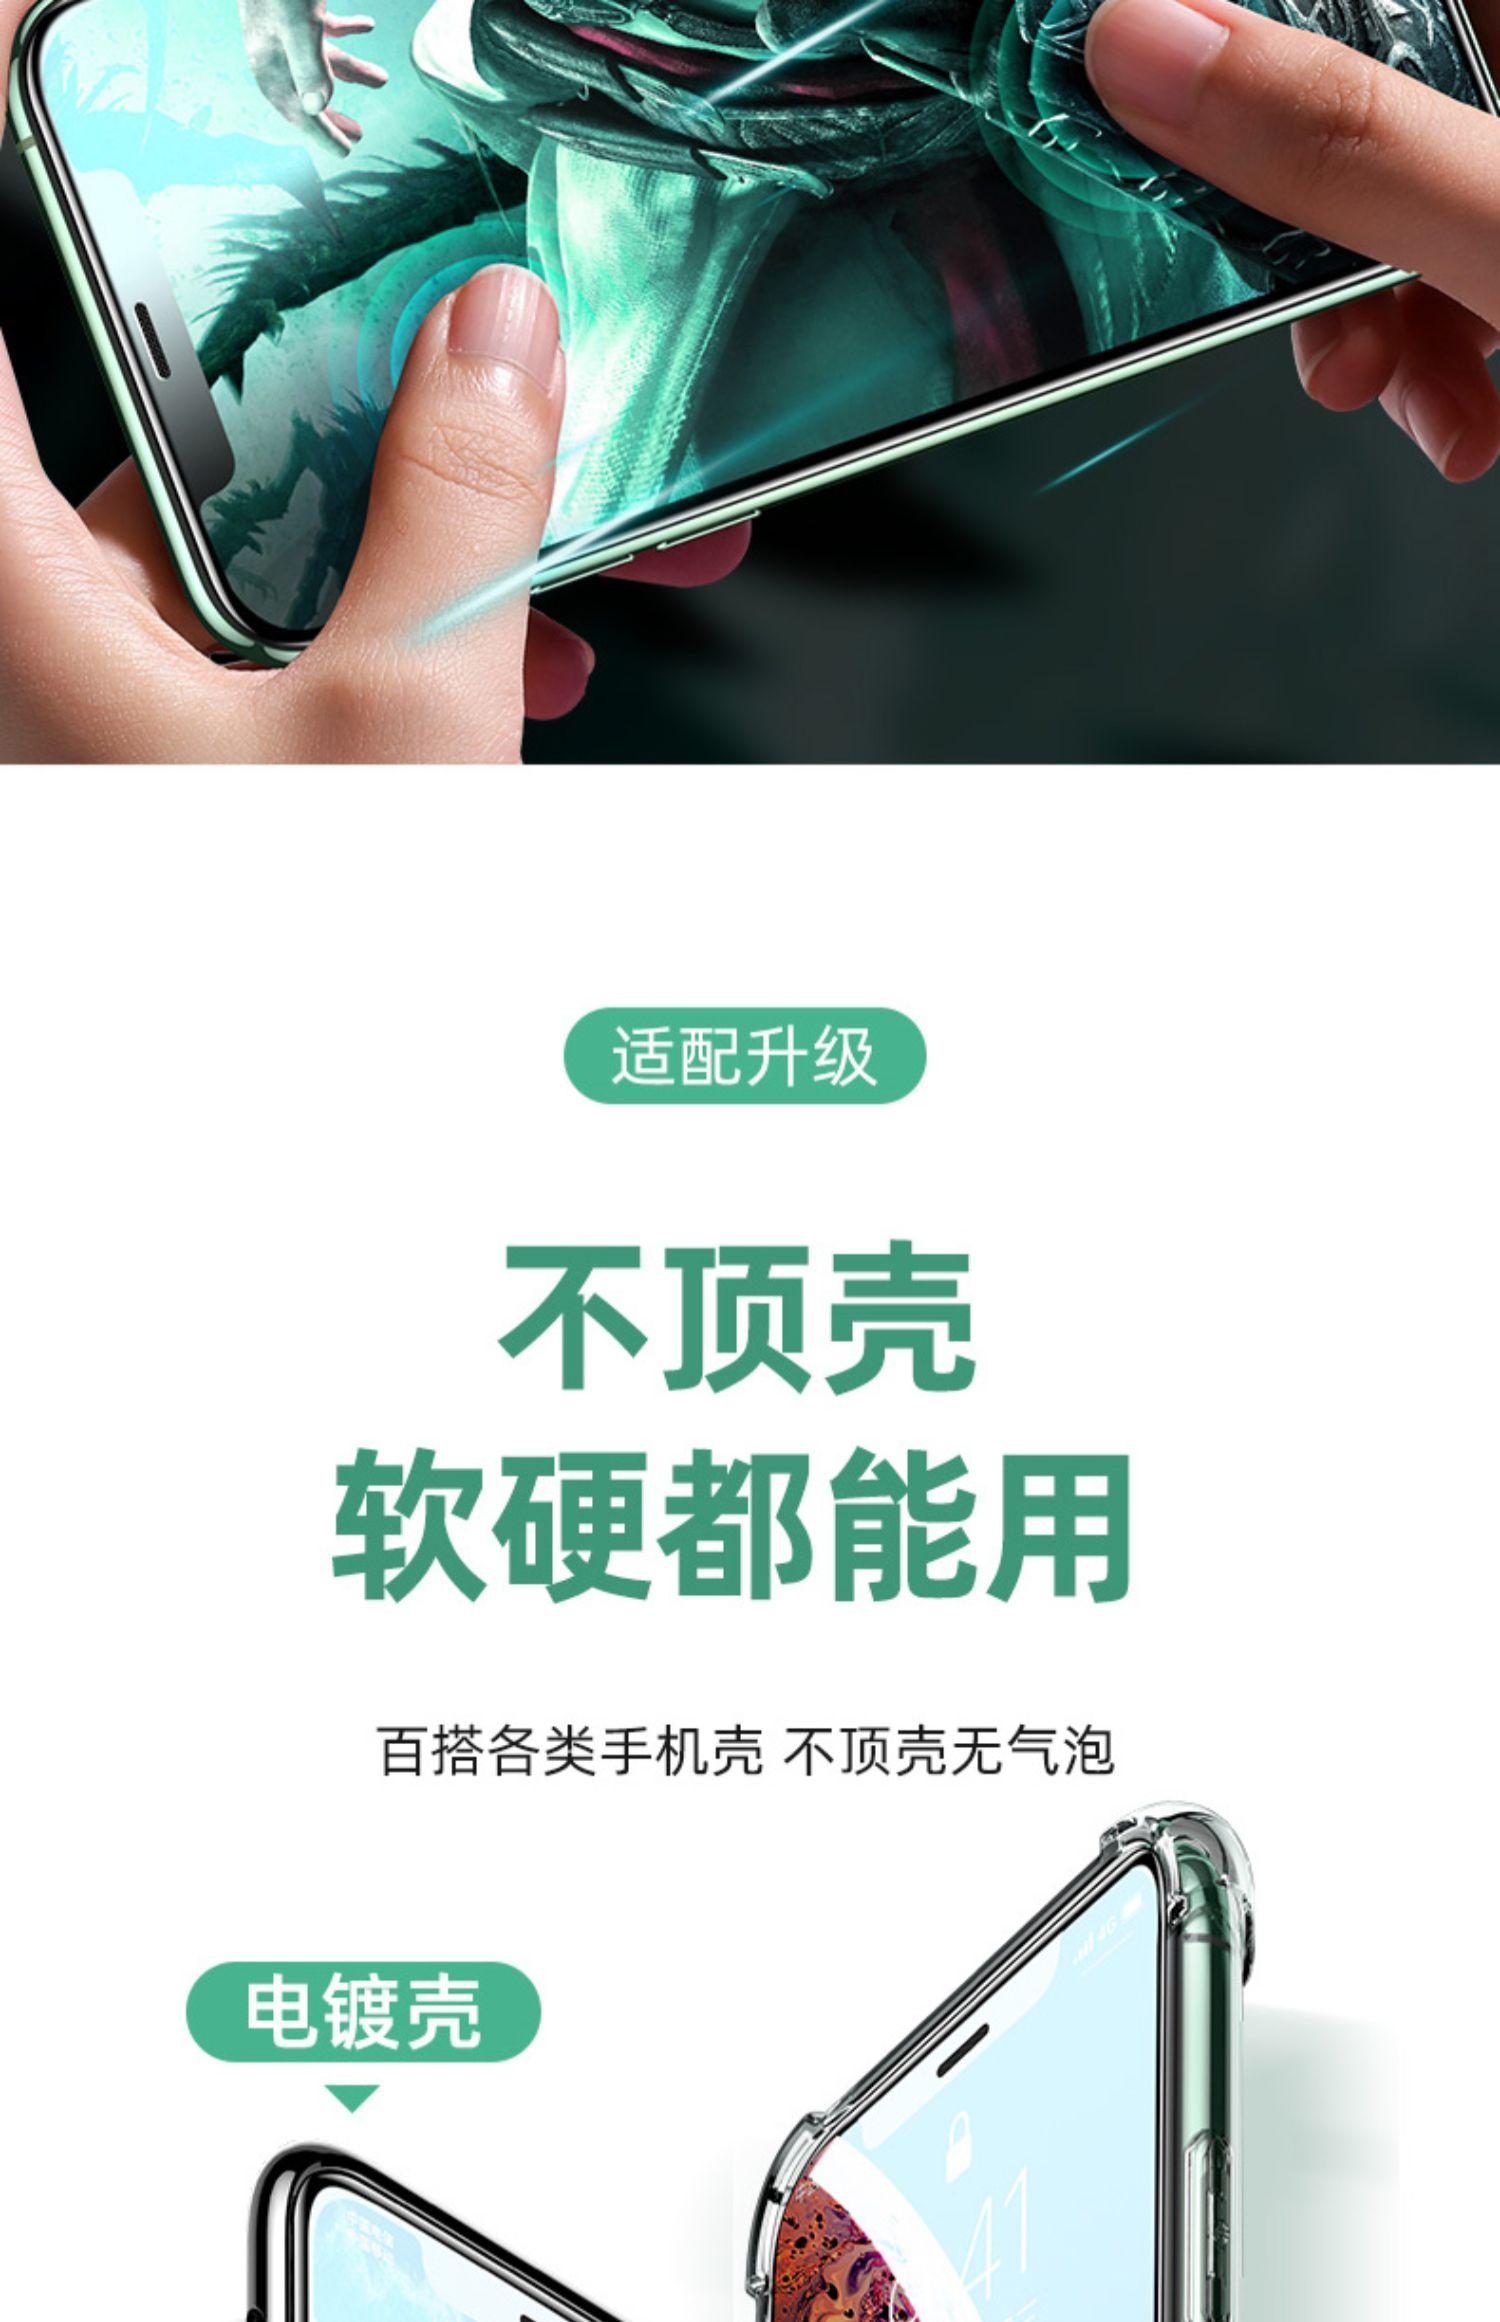 iphone11 / 12钢化苹果xr 7手机膜